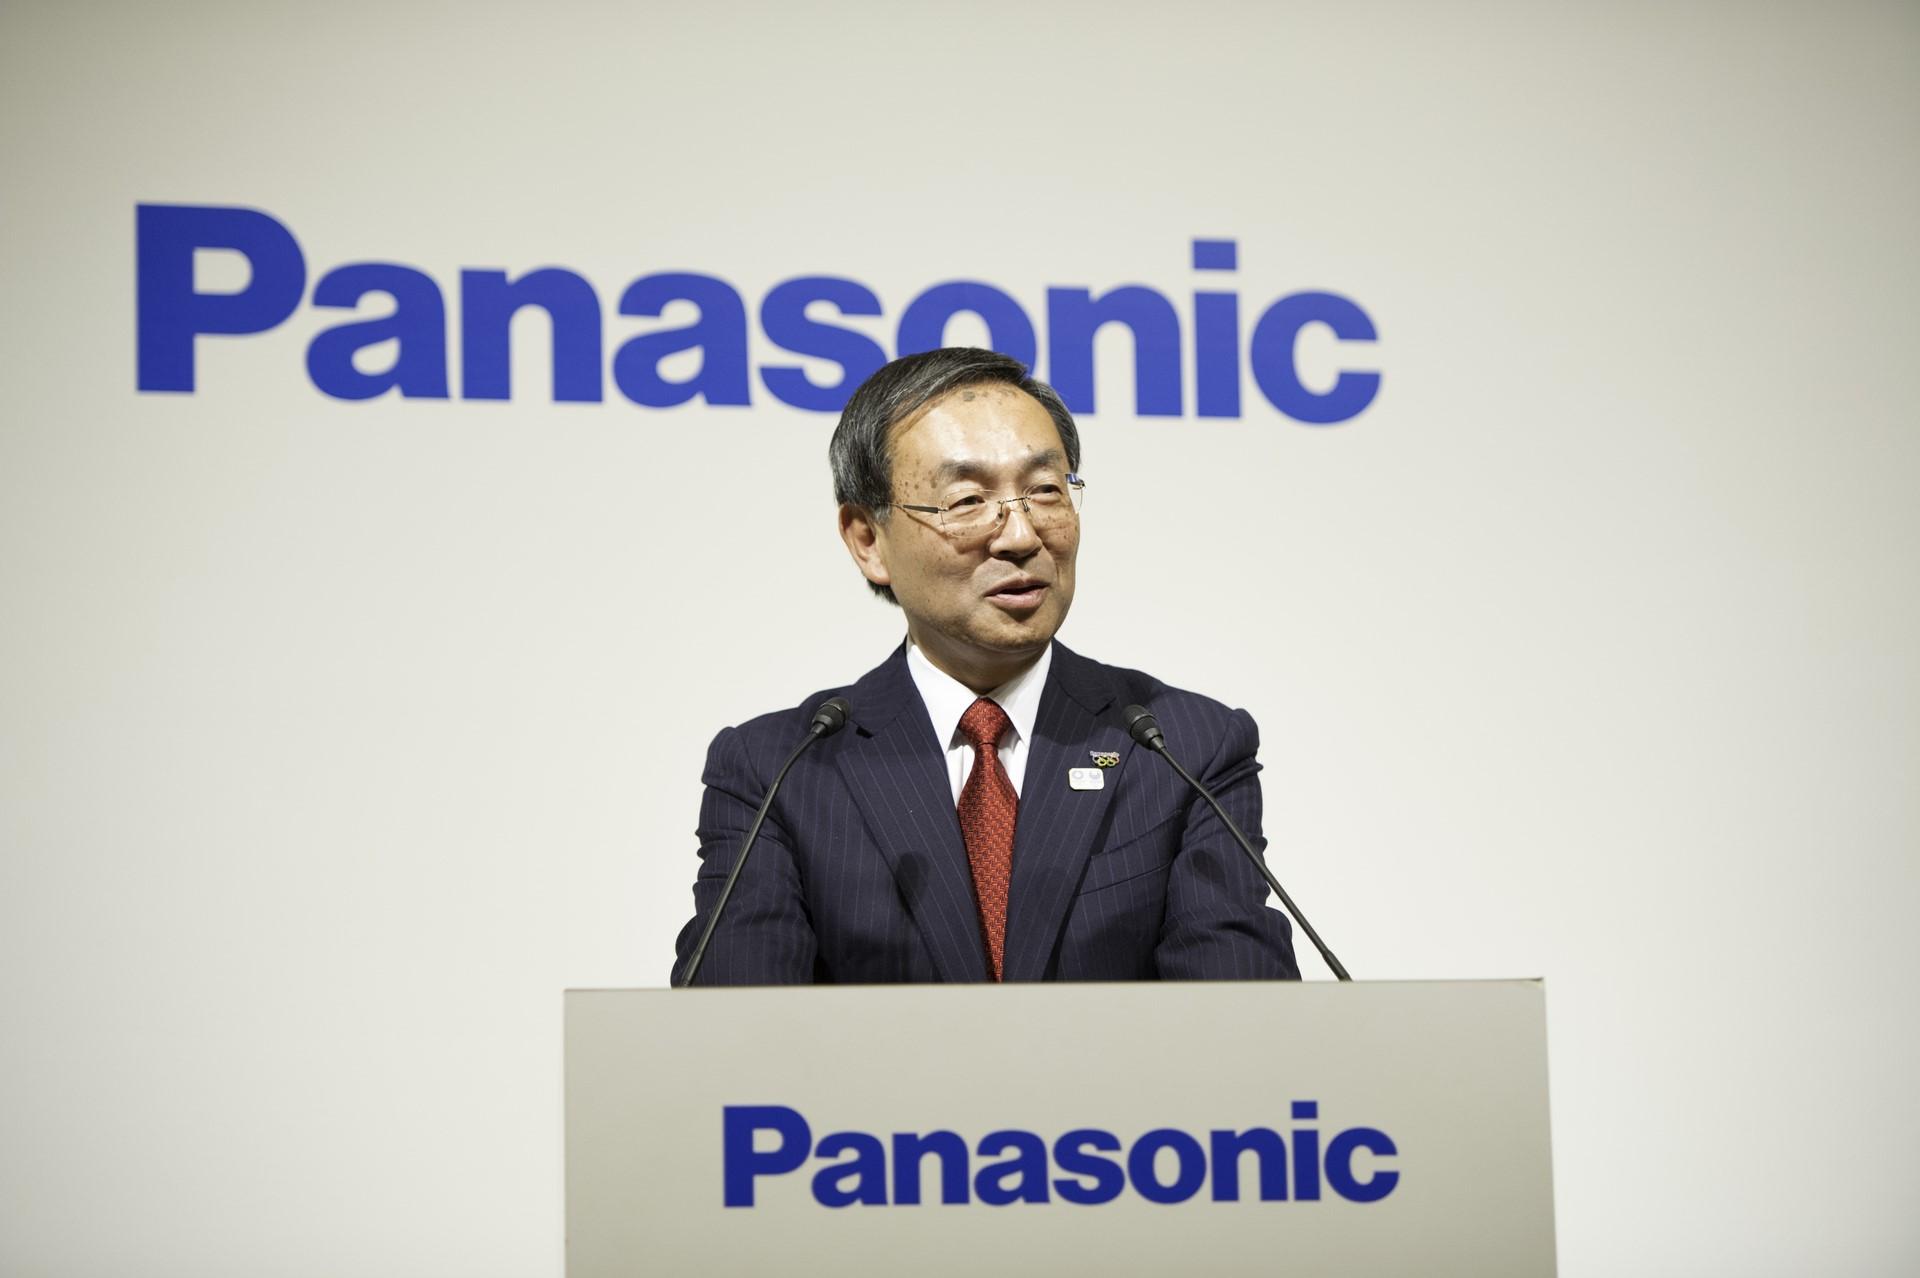 Toyota Panasonic Joint Automotive Prismatic Battery Business (9)